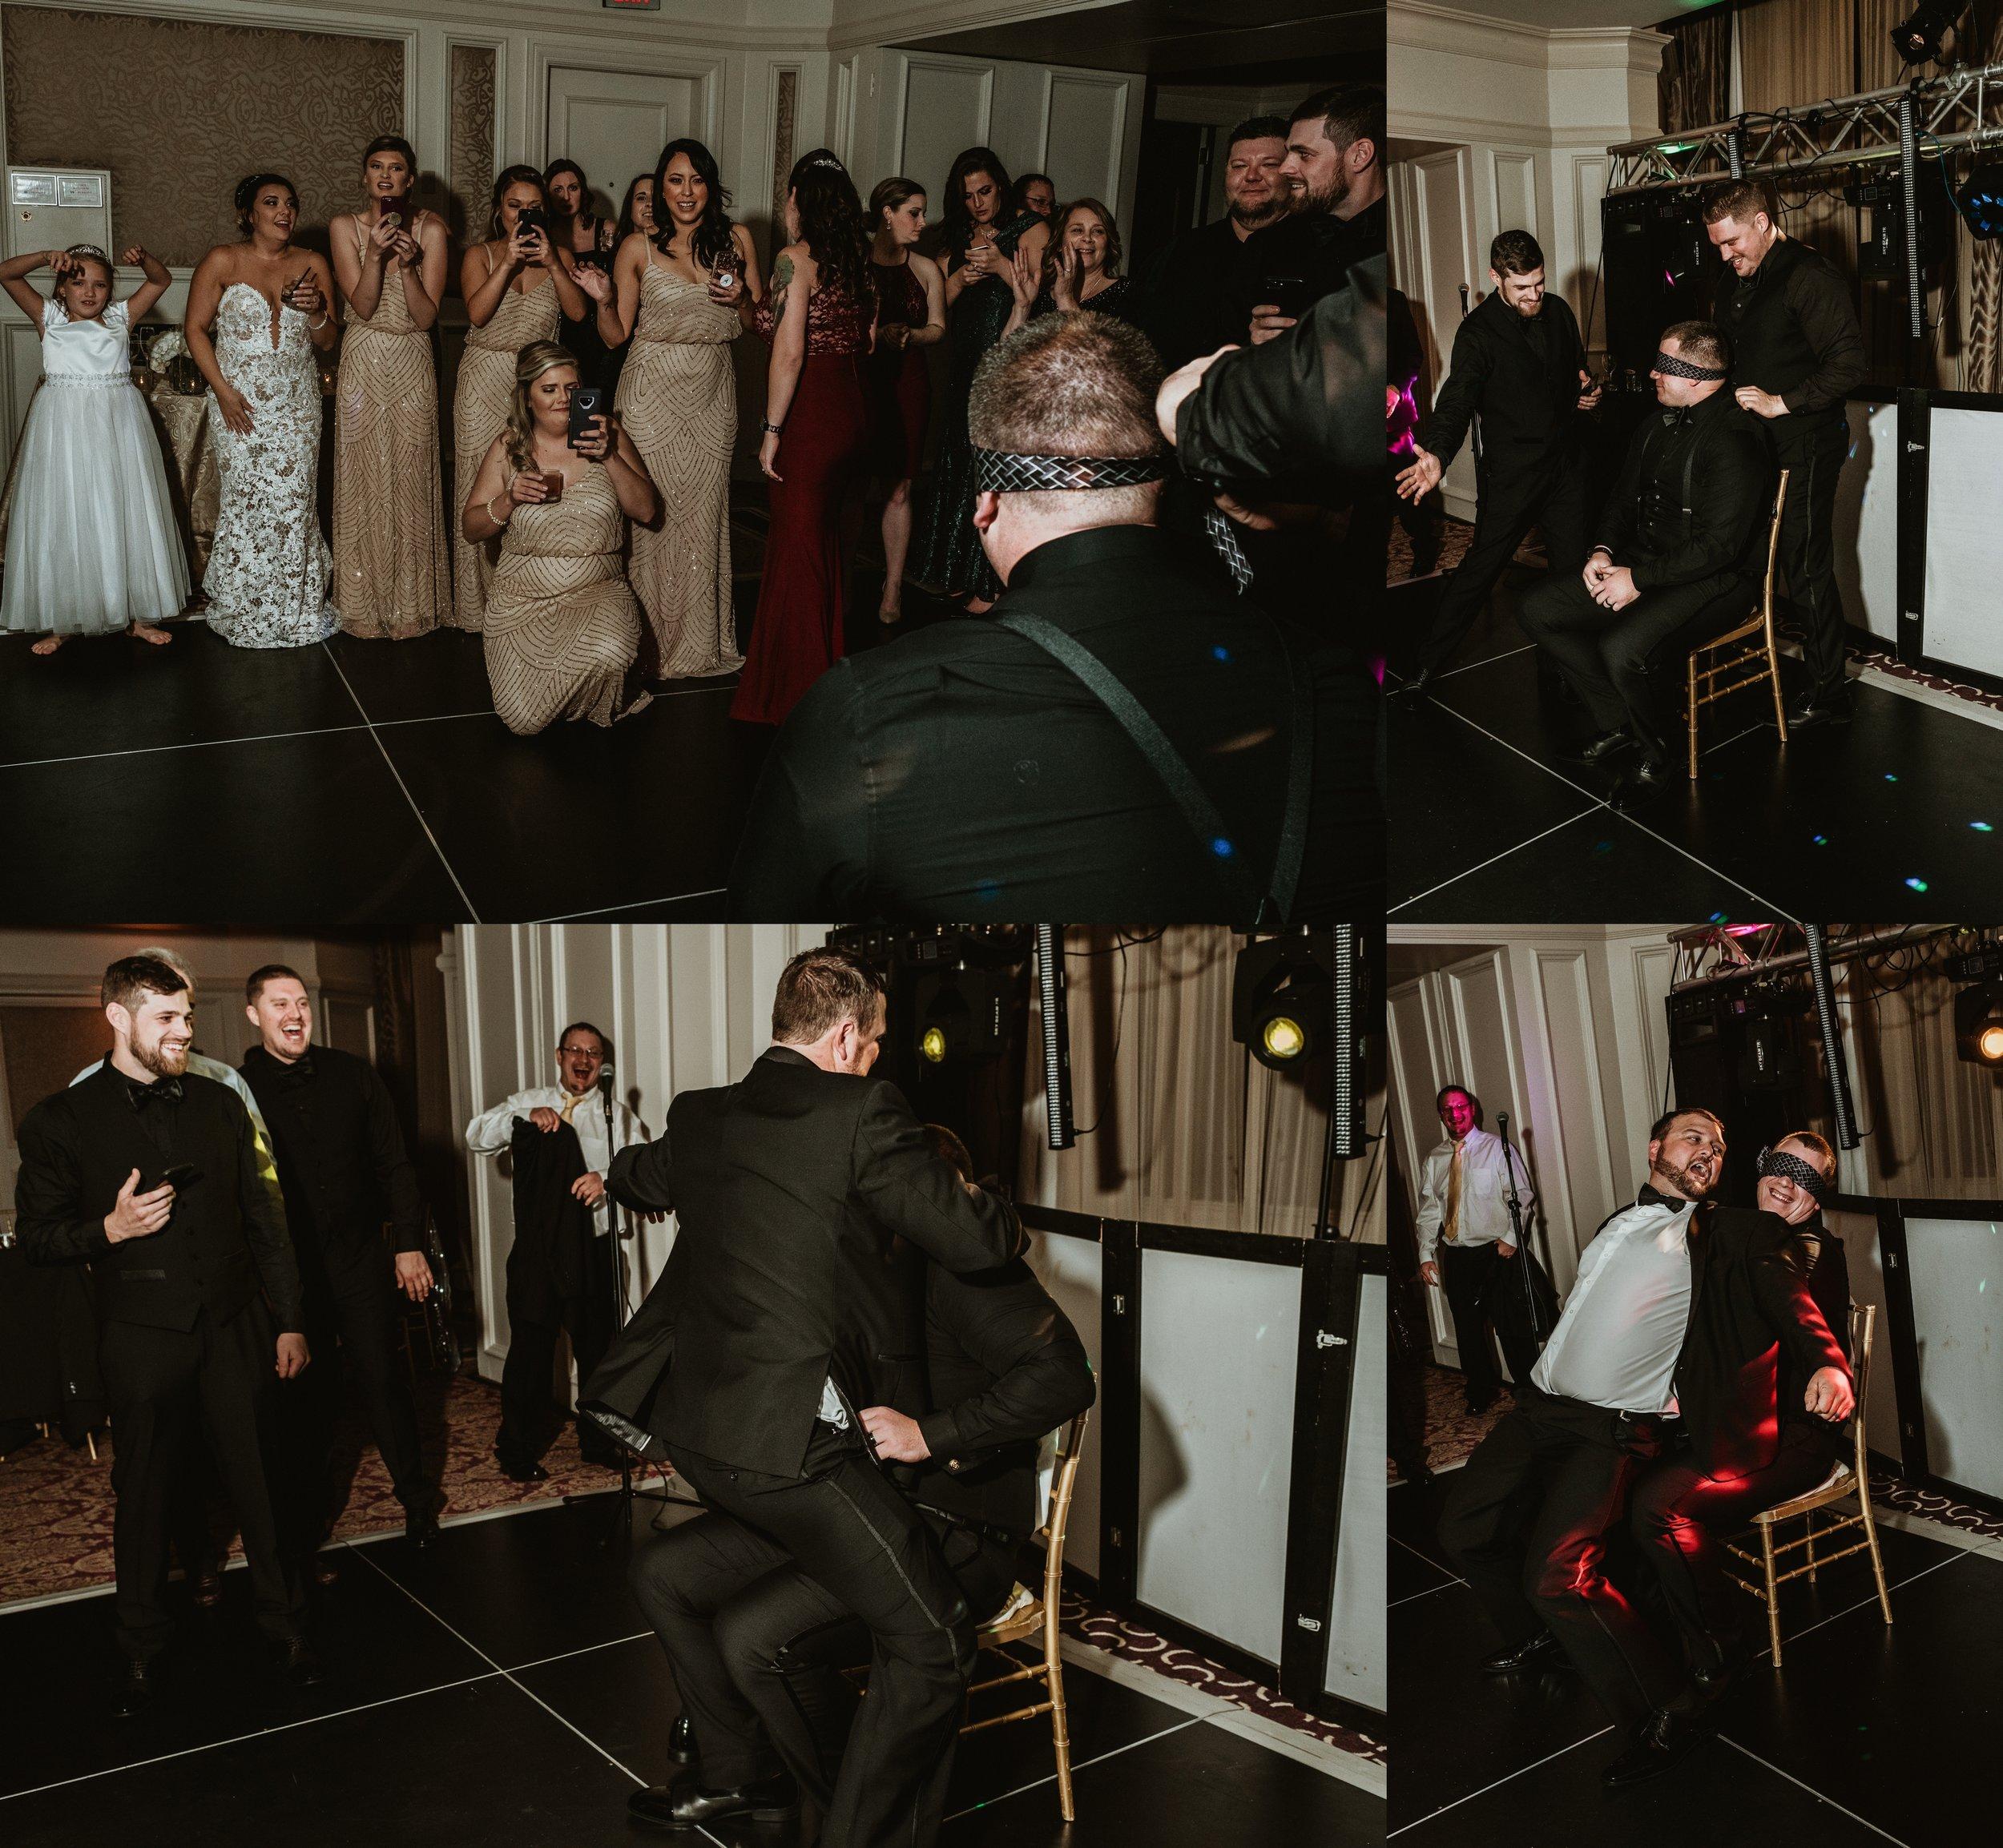 Classic Vintage Wedding   Ritz Carlton Atlanta, Georgia   Terry Farms Photography   Reception Party Dance